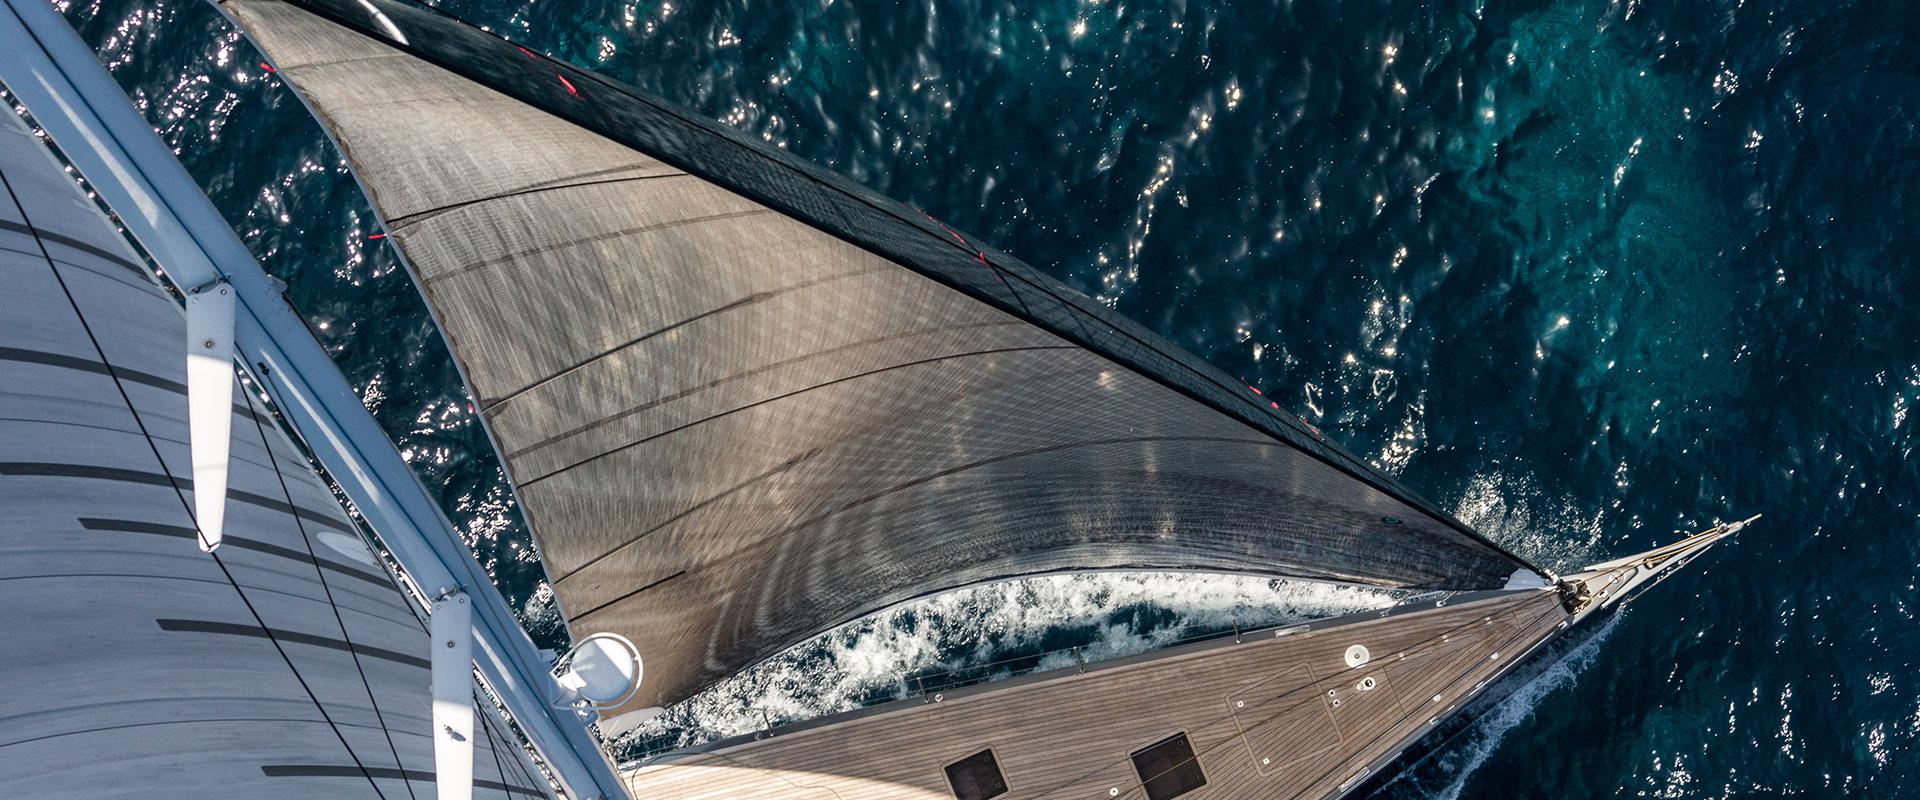 A Fresh Wind fills Southern Wind's Sails